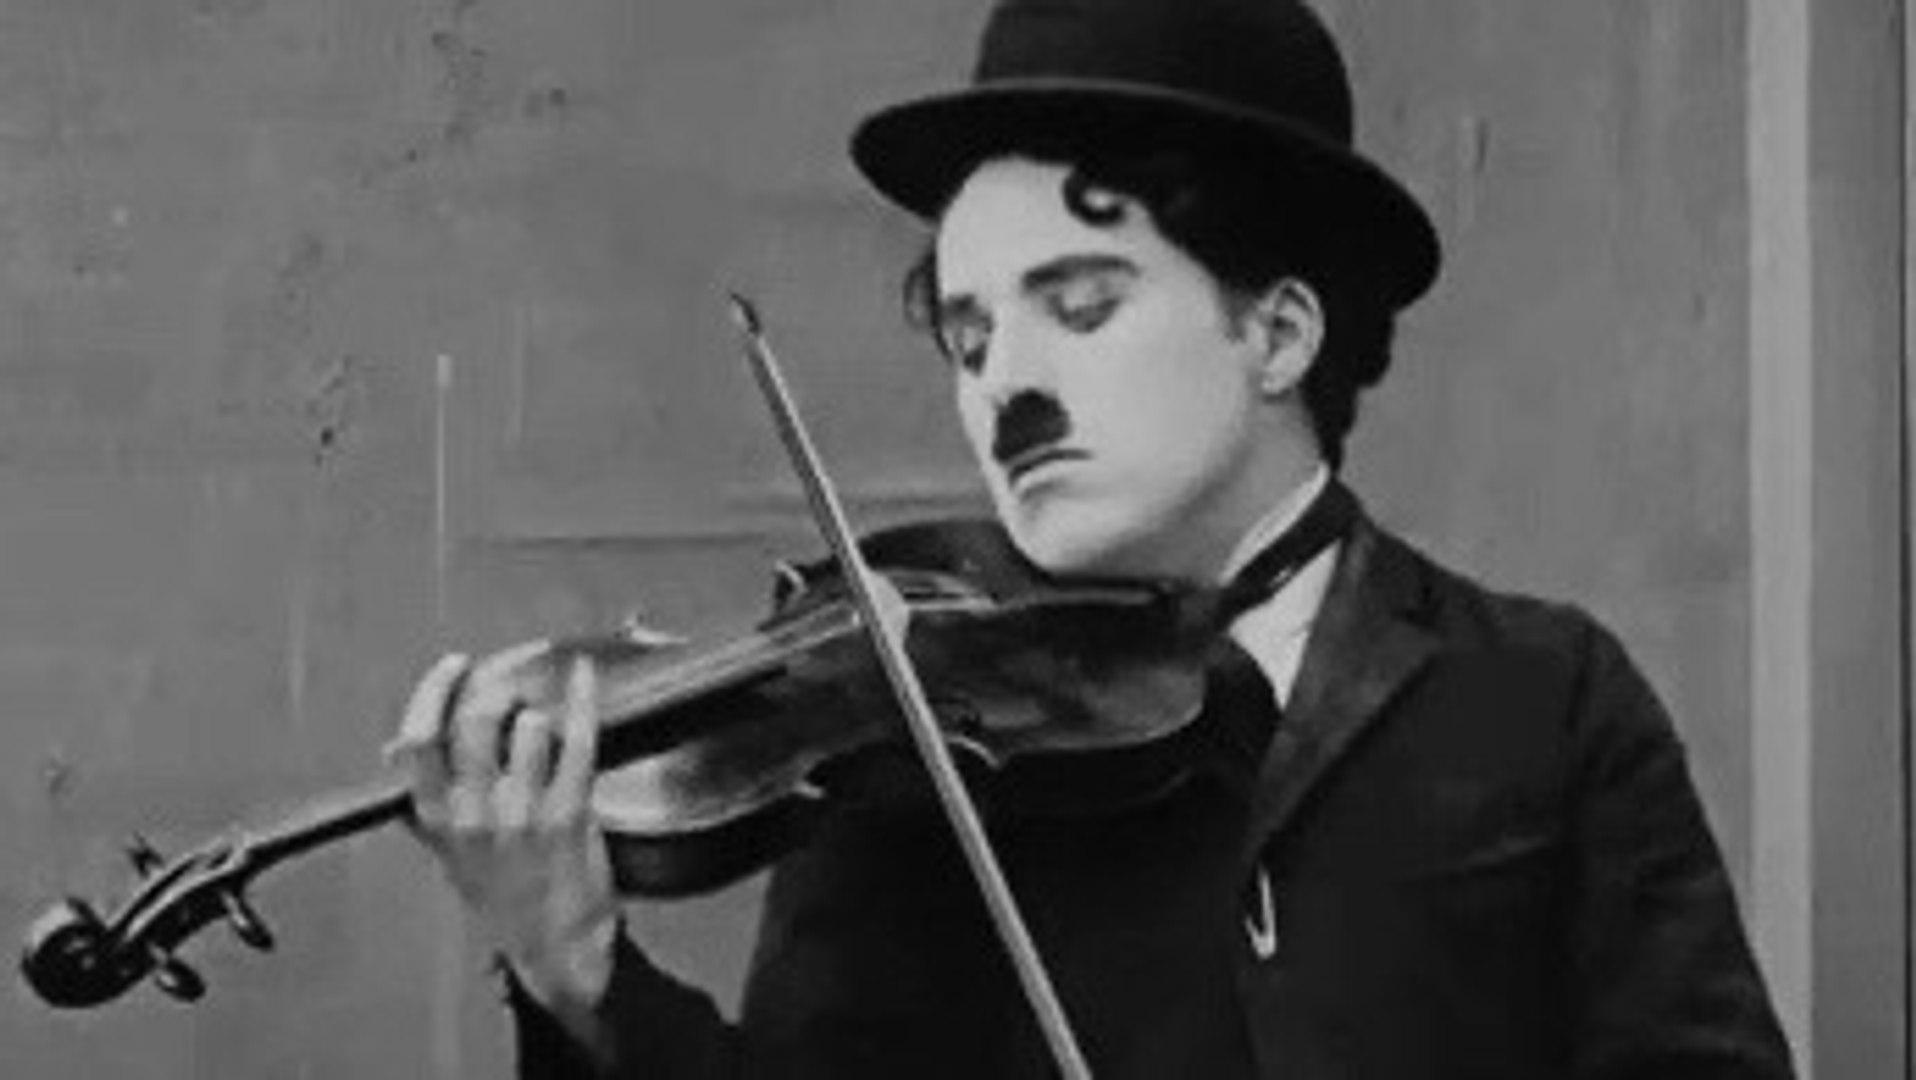 The Vagabond (1916) Charles Chaplin, Edna Purviance, Eric Campbell.  Short, Comedy, Romance